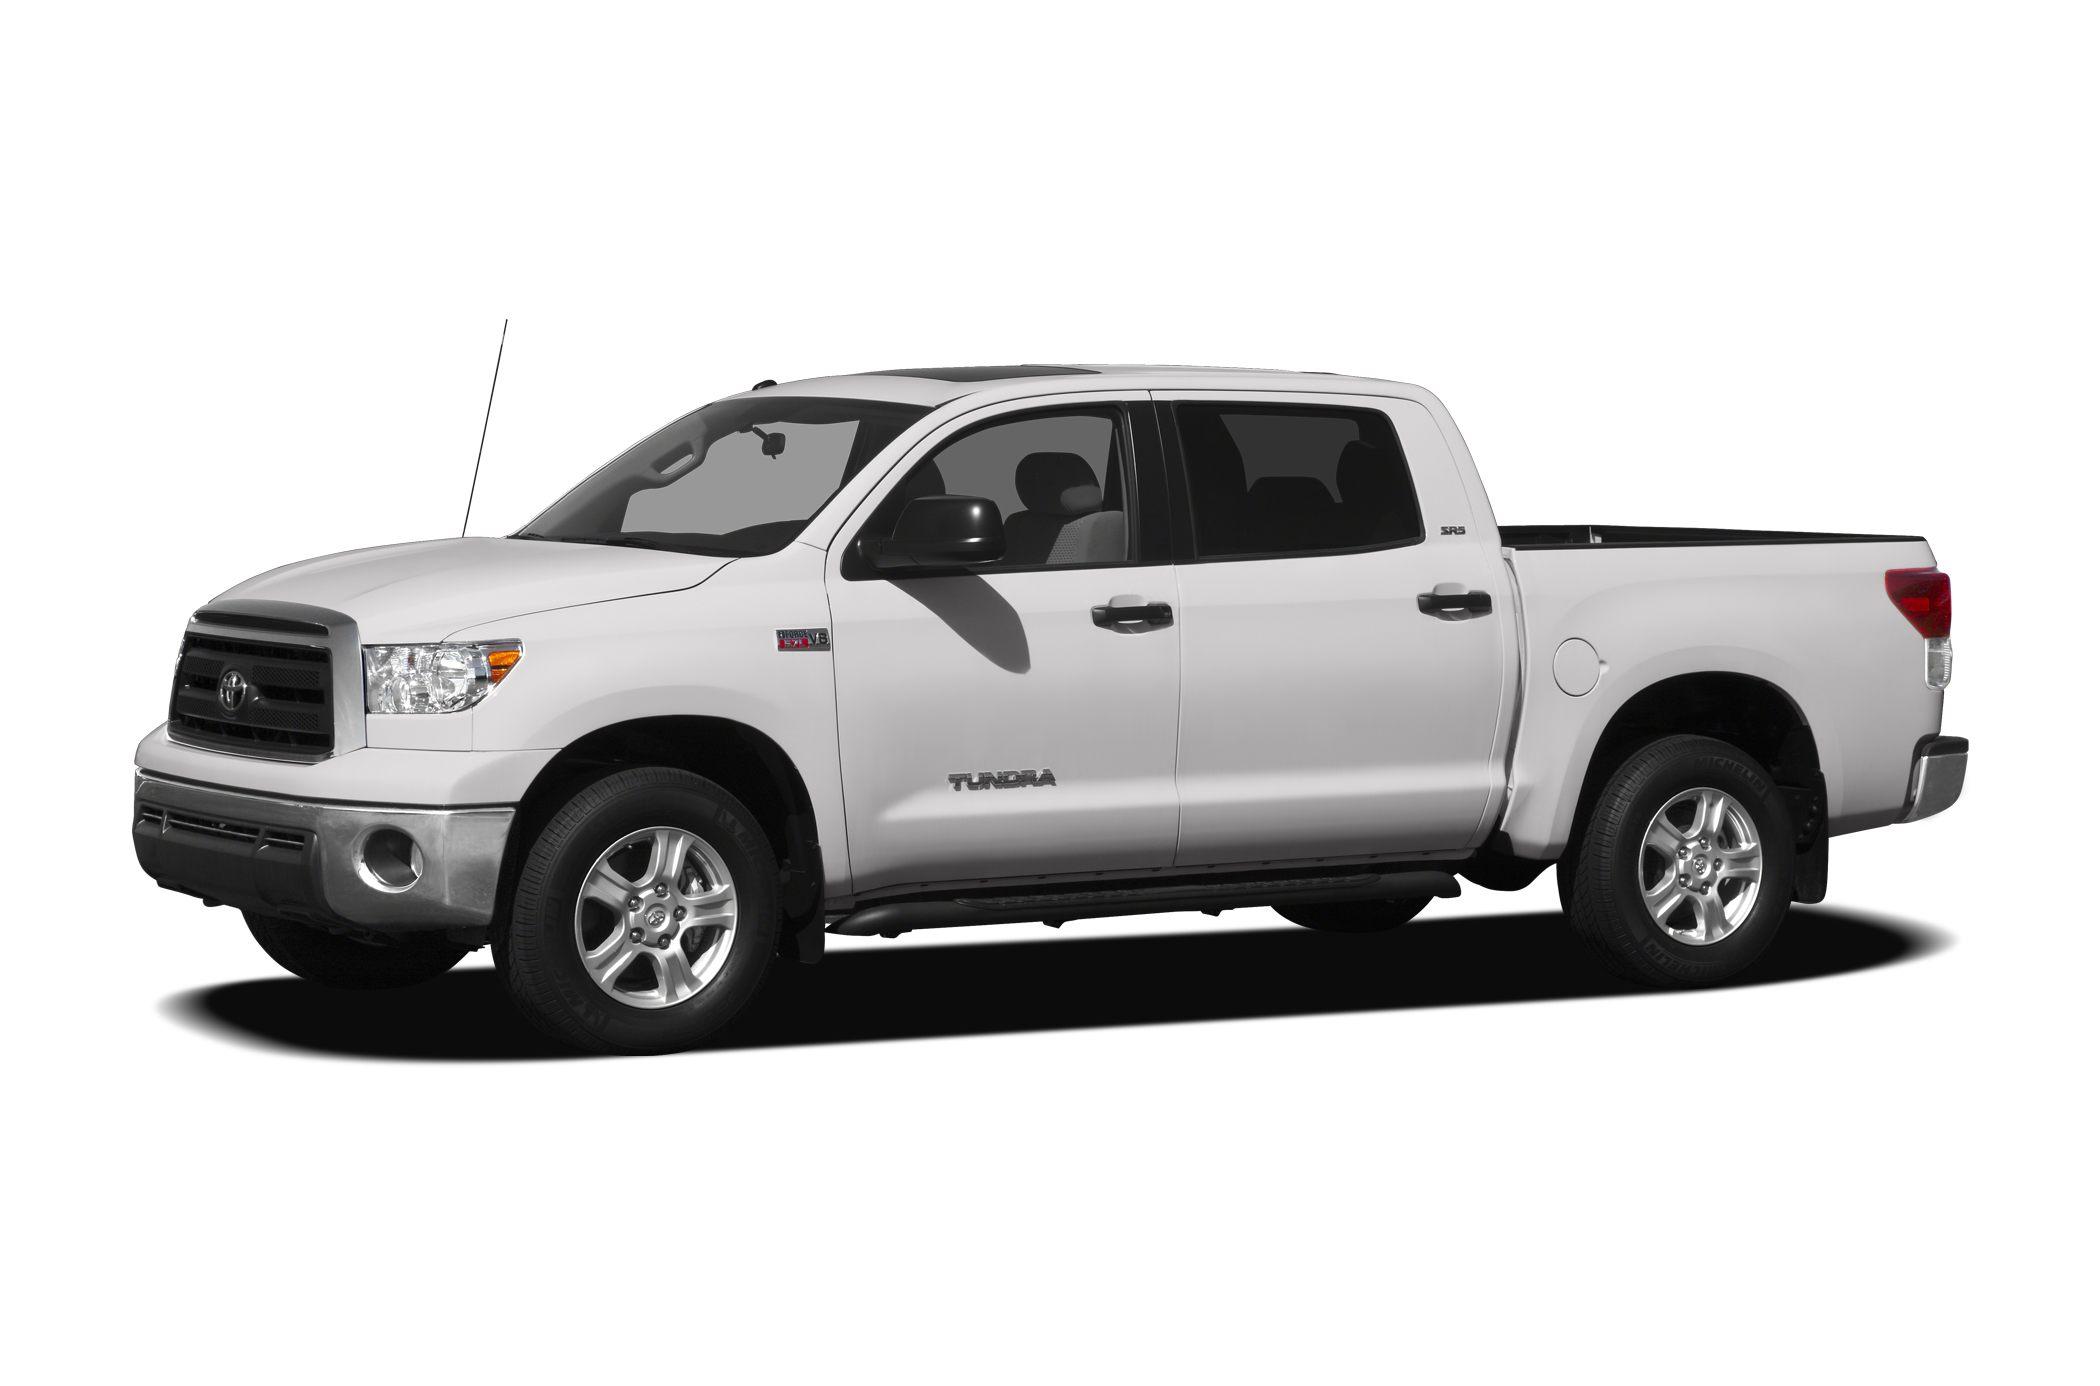 2012 Toyota Tundra Grade 5.7L V8 4x4 Crew Max 5.6 Ft. Box 145.7 In. WB  Specs And Prices